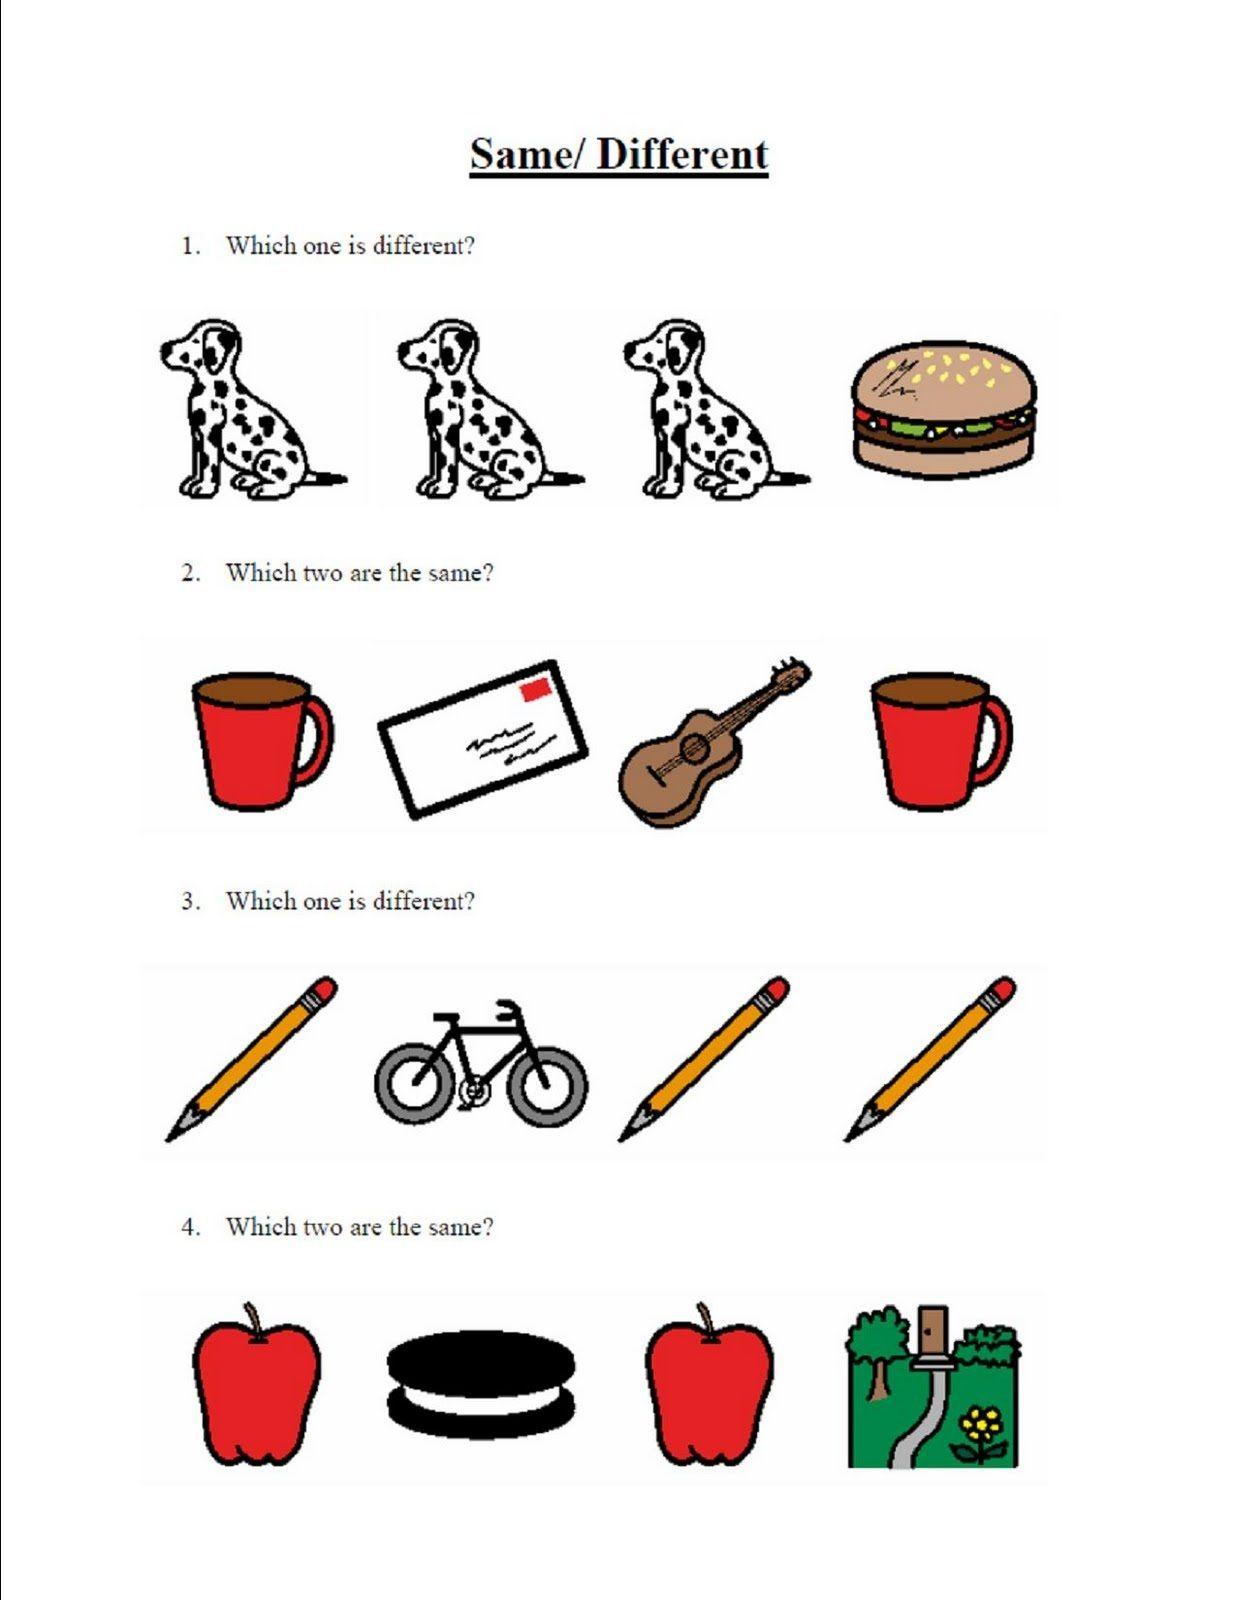 worksheet Therapy Worksheets For Kids same and different worksheets for kids activity shelter shelter